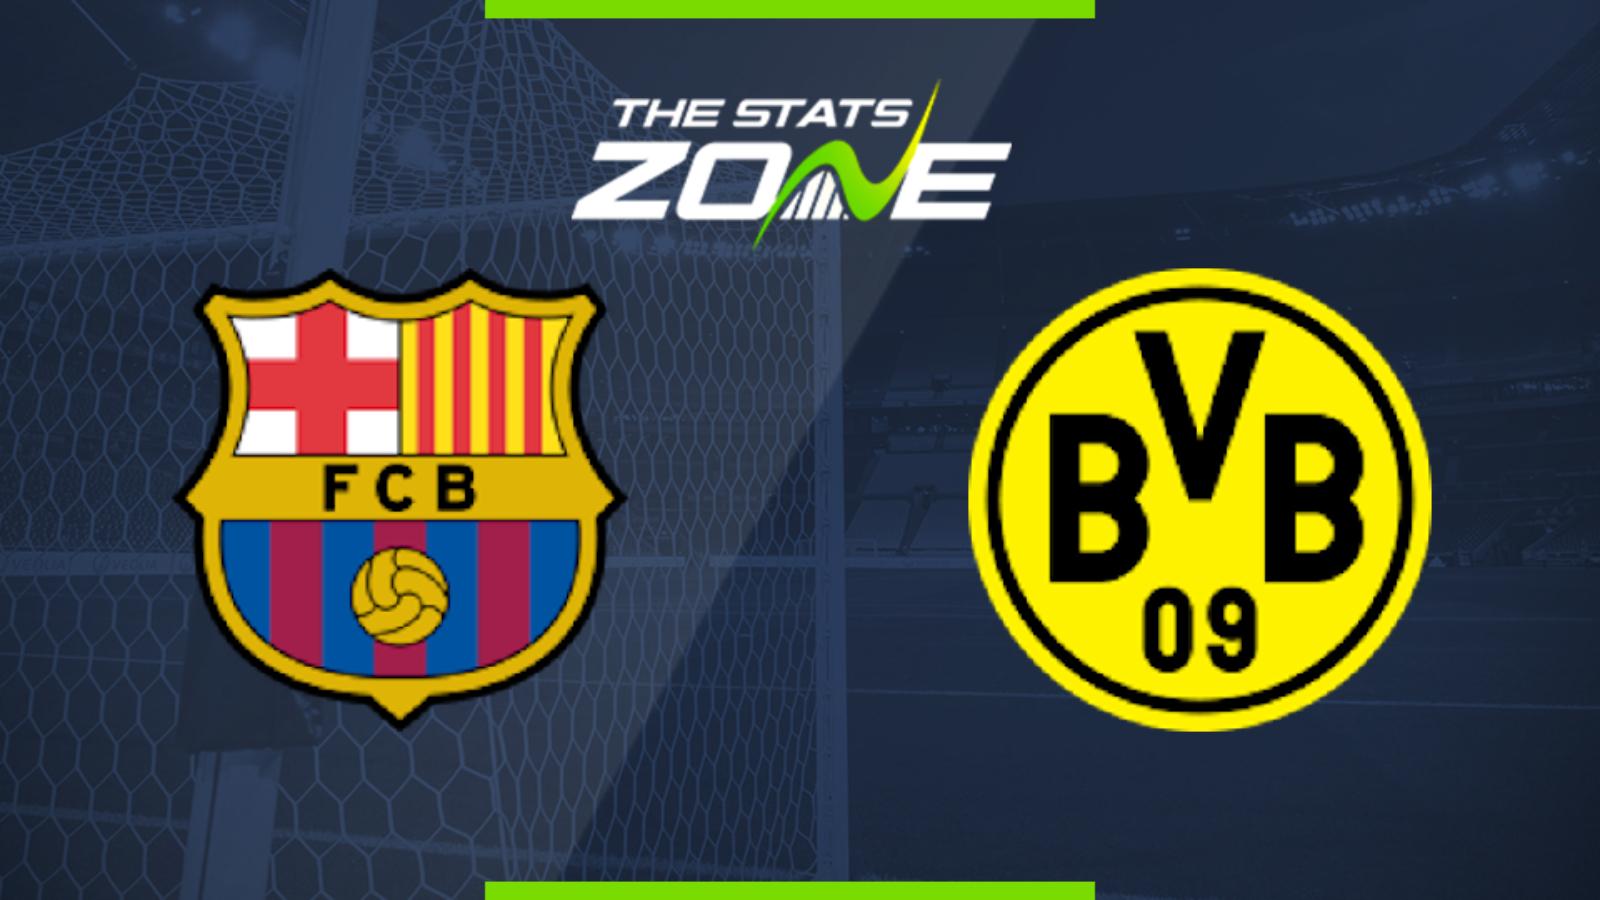 2019 20 Uefa Champions League Barcelona Vs Borussia